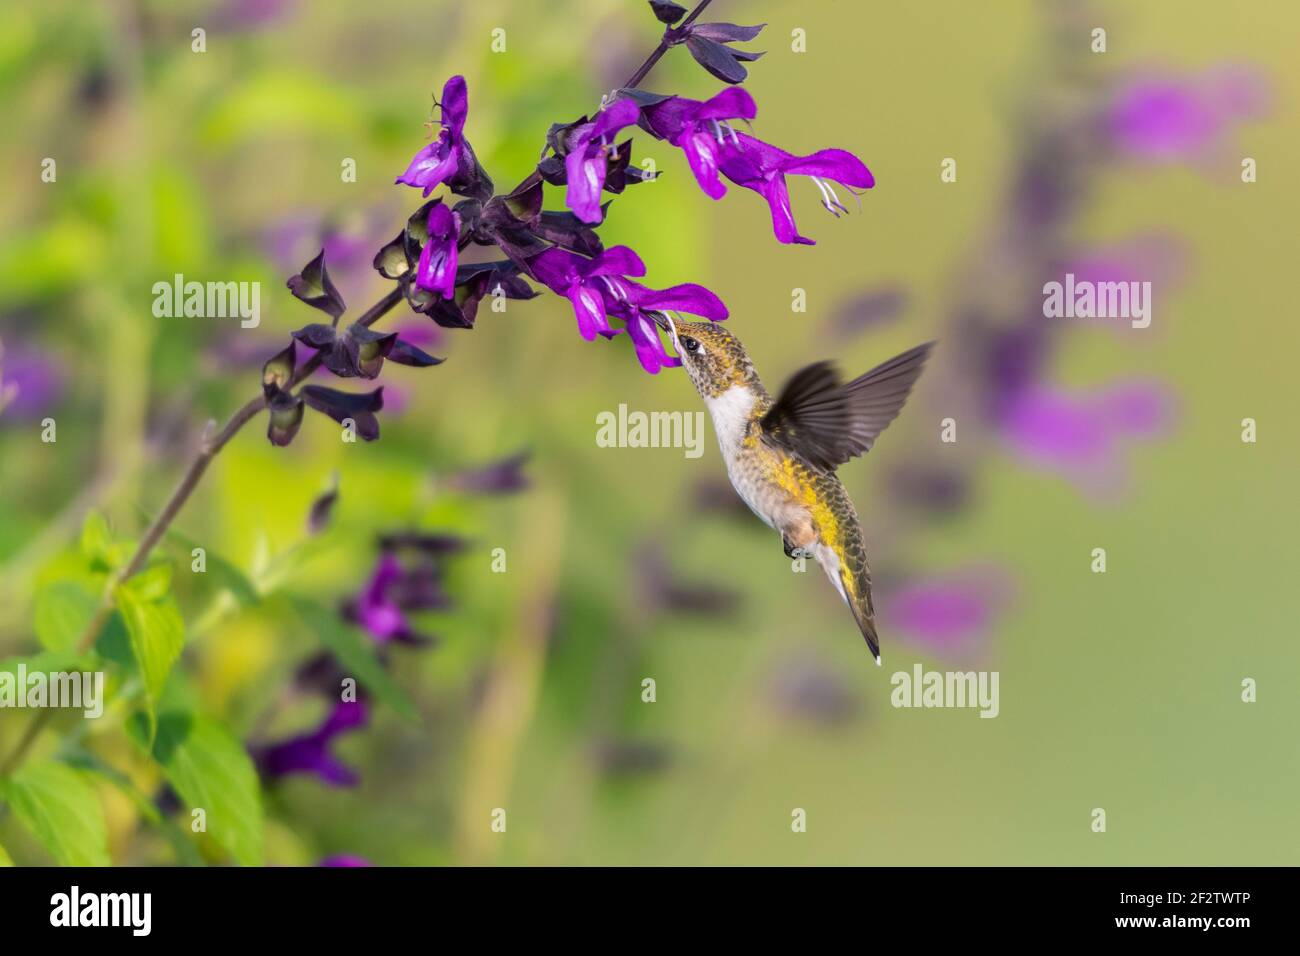 01162-16318 Hummingbird de garganta rubí (Archilochus colubris) en Salvia 'Purple and Bloom' (Salvia guaranitica) Marion Co. IL Foto de stock